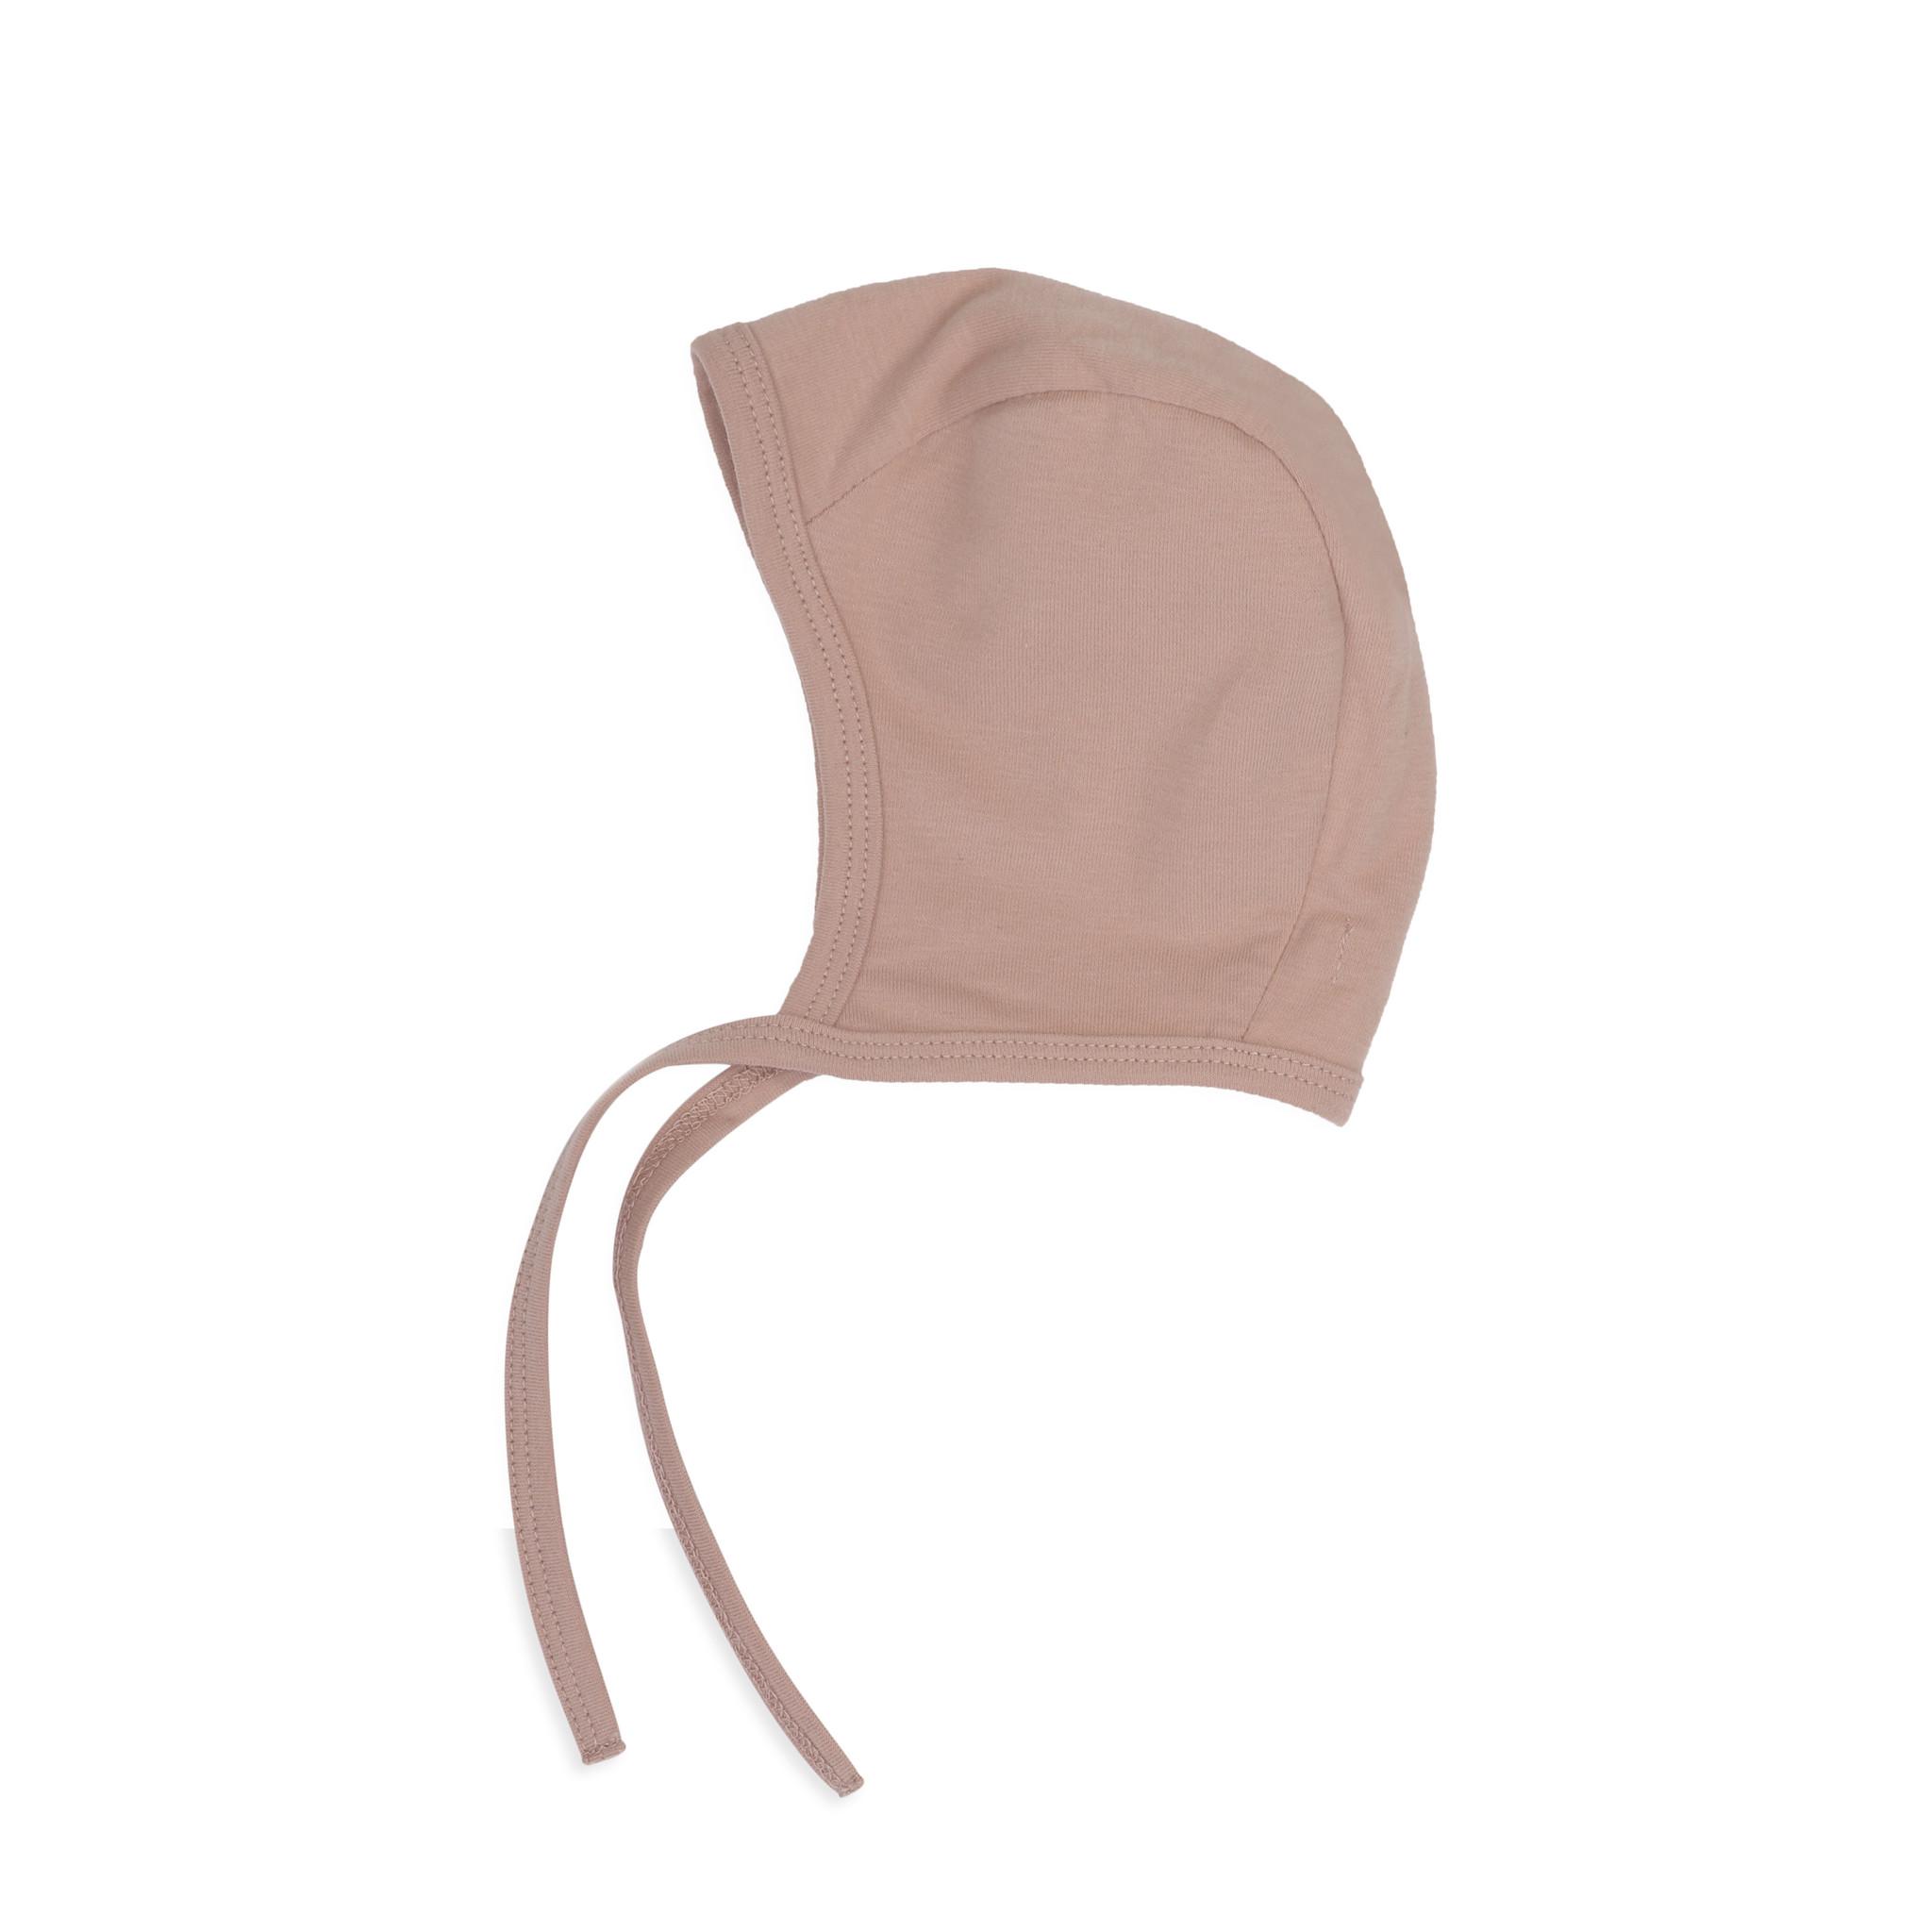 Baby bonnet - Vintage blush-1